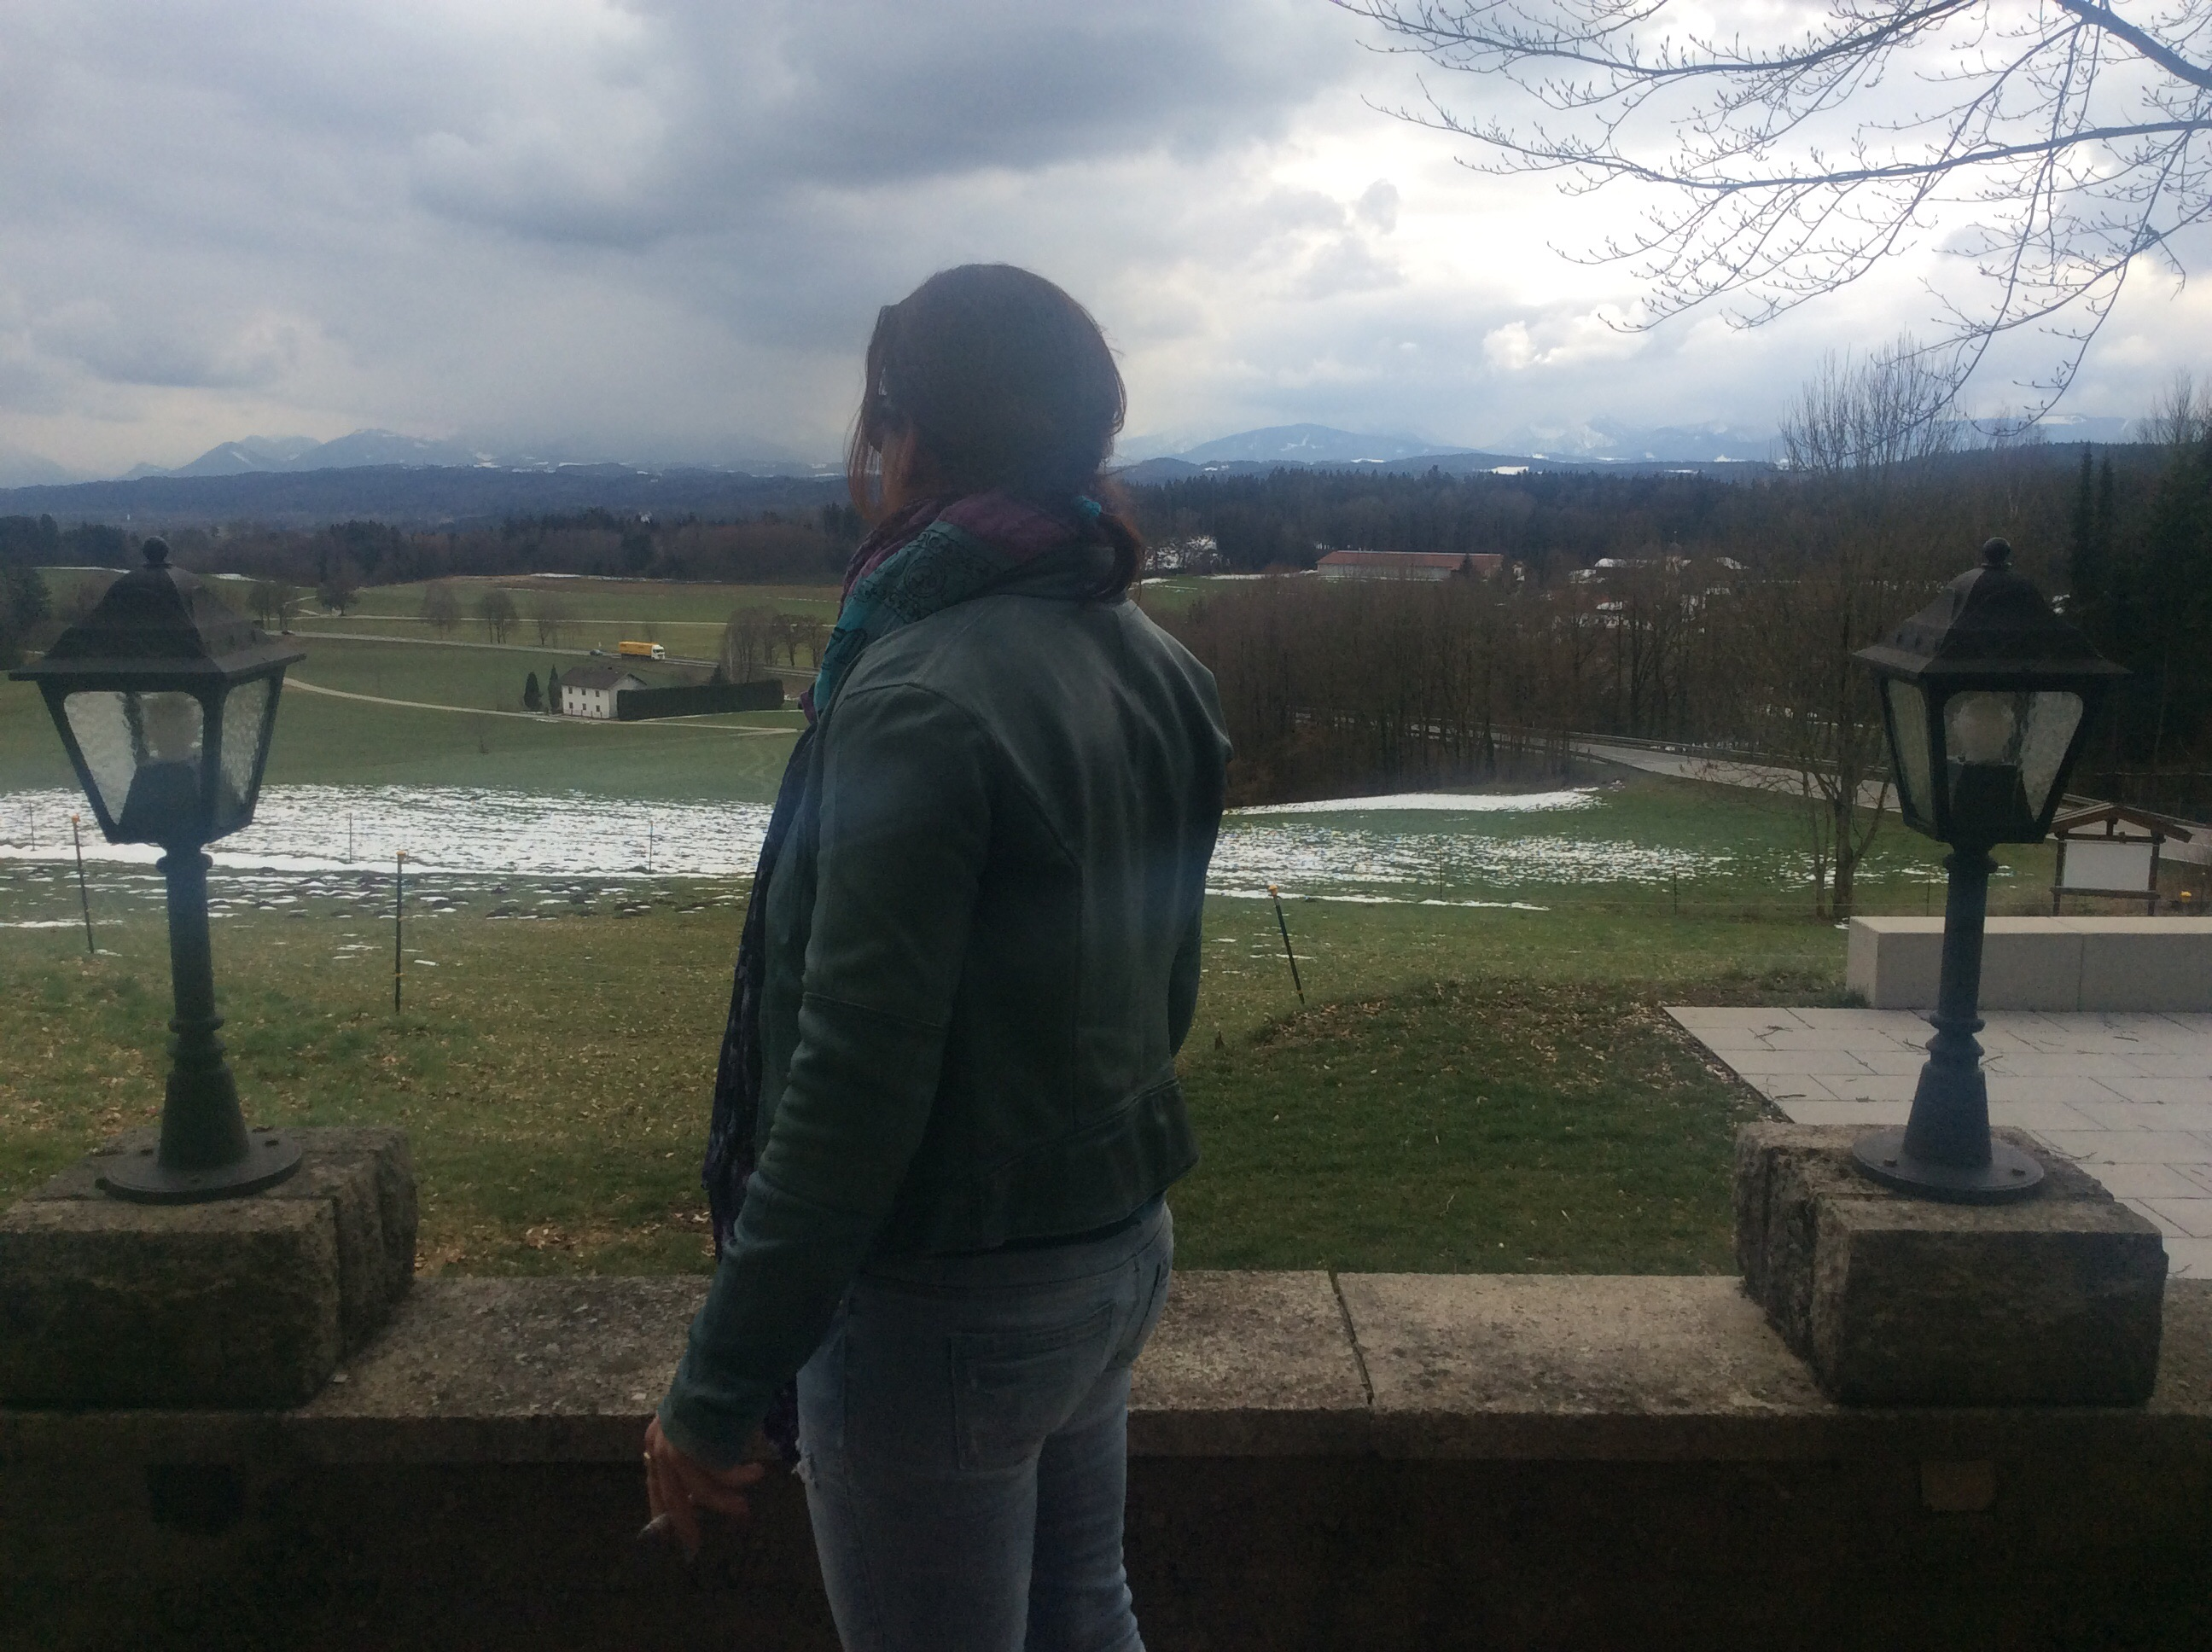 Grandioser Bergblick